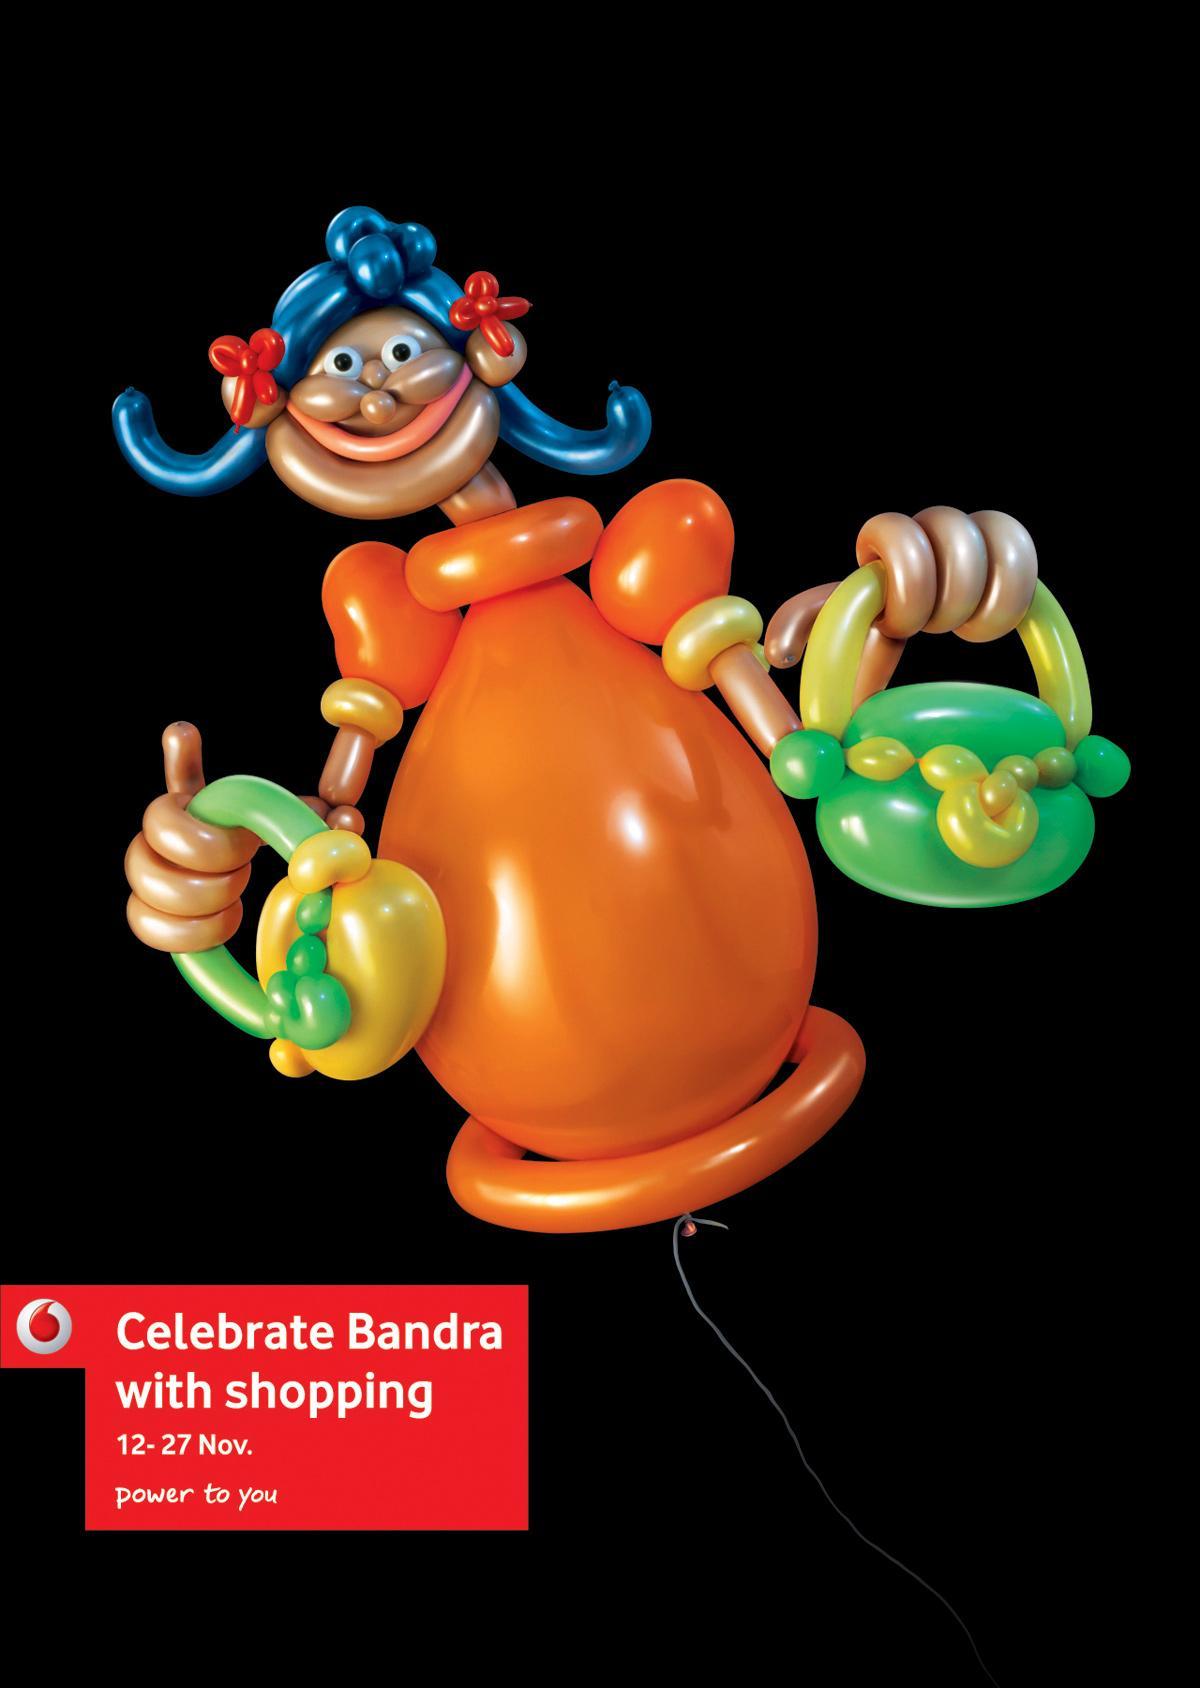 Vodafone Print Ad -  Celebrate Bandra, Purses